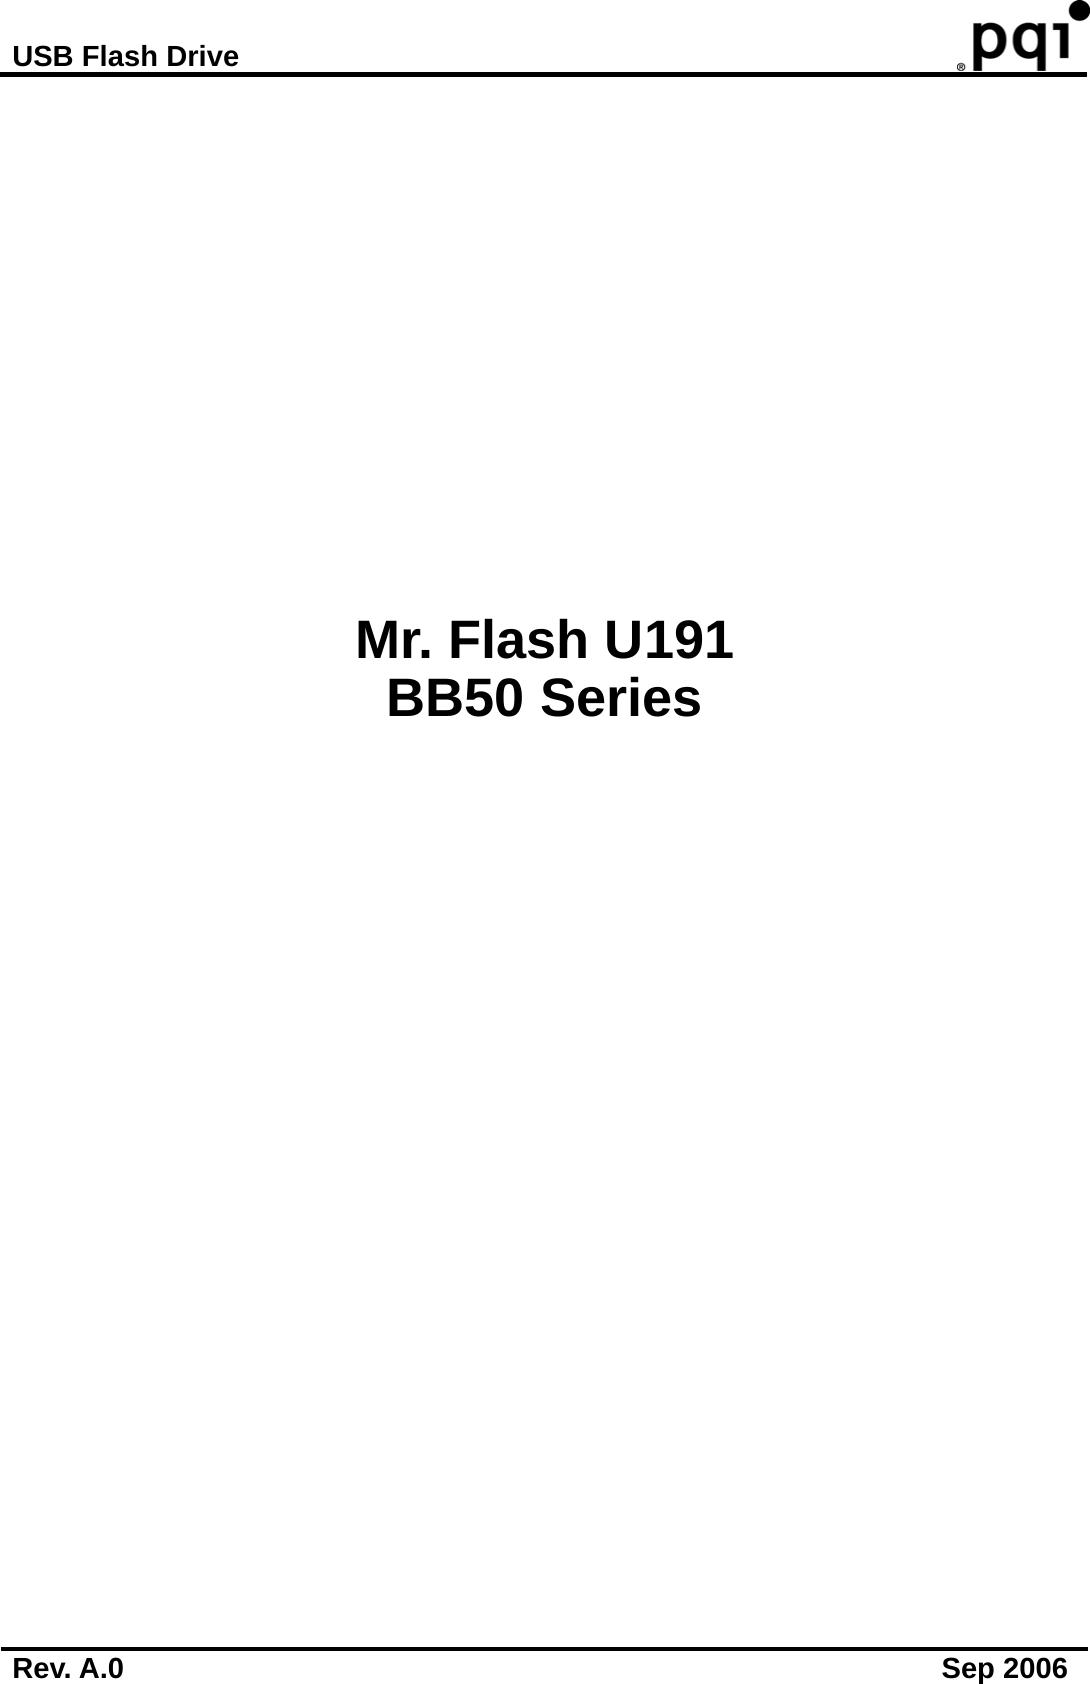 pqi u191 v1 a 0 user manual to the 6d20064c 70c3 1f04 5502 79b1e5e1802d rh usermanual wiki pqi air bank user manual PQI USB 3.0